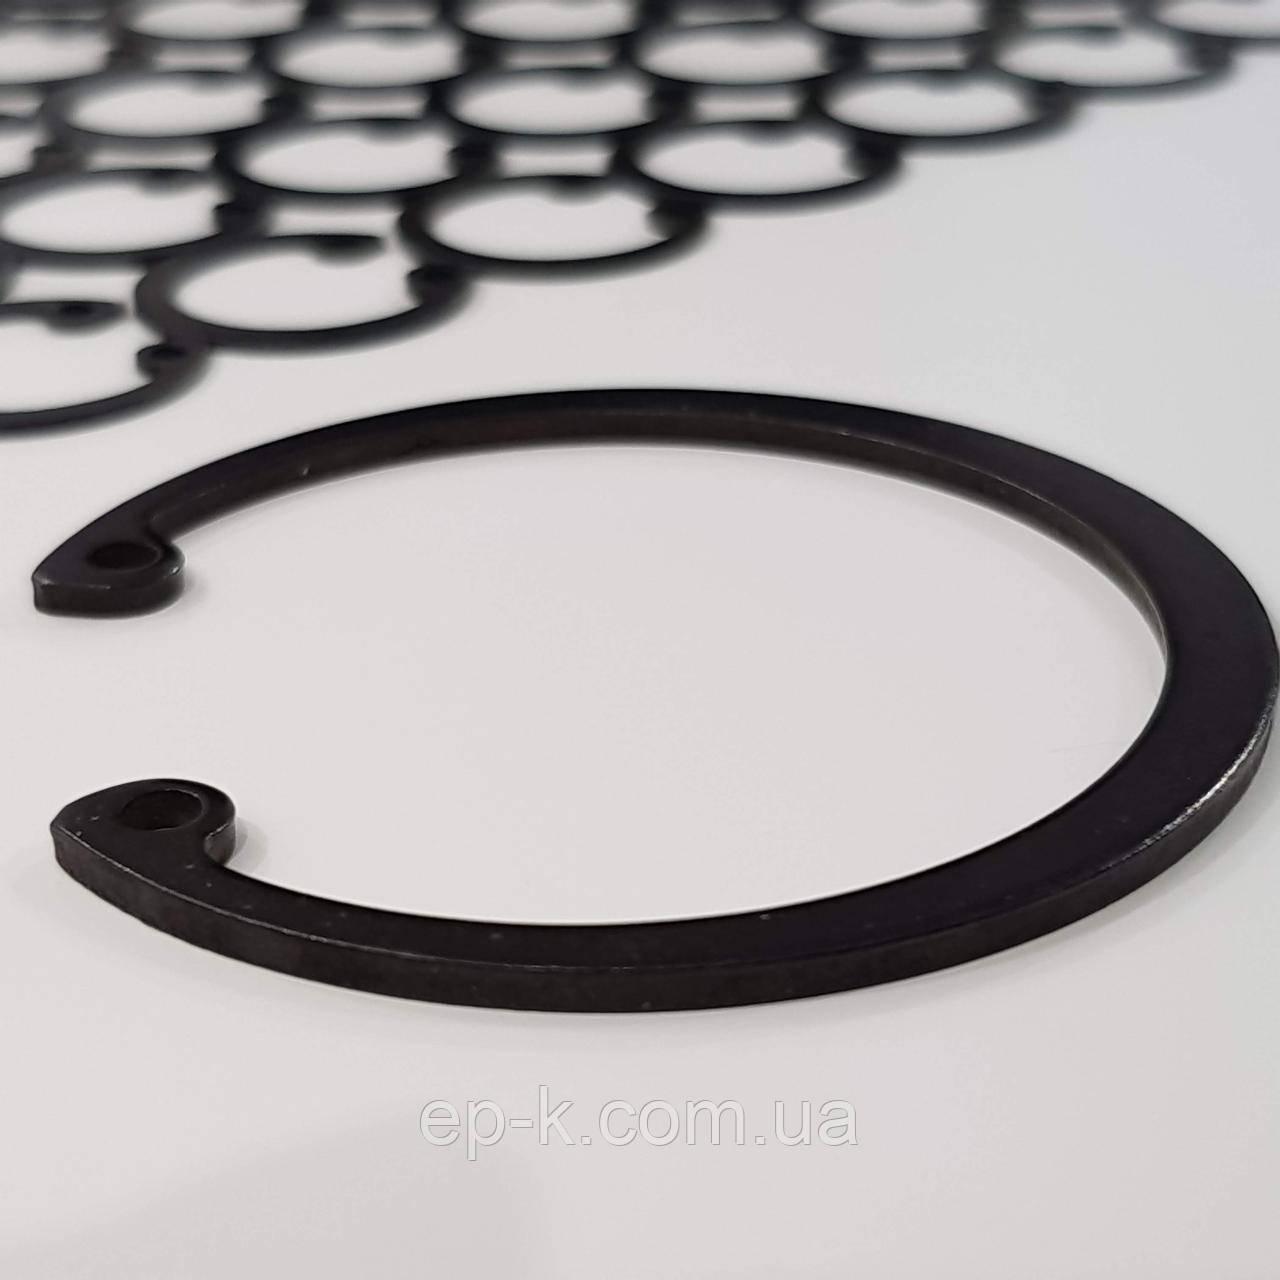 Стопорное кольцо внутреннее А130  ГОСТ 13943-86, DIN 472